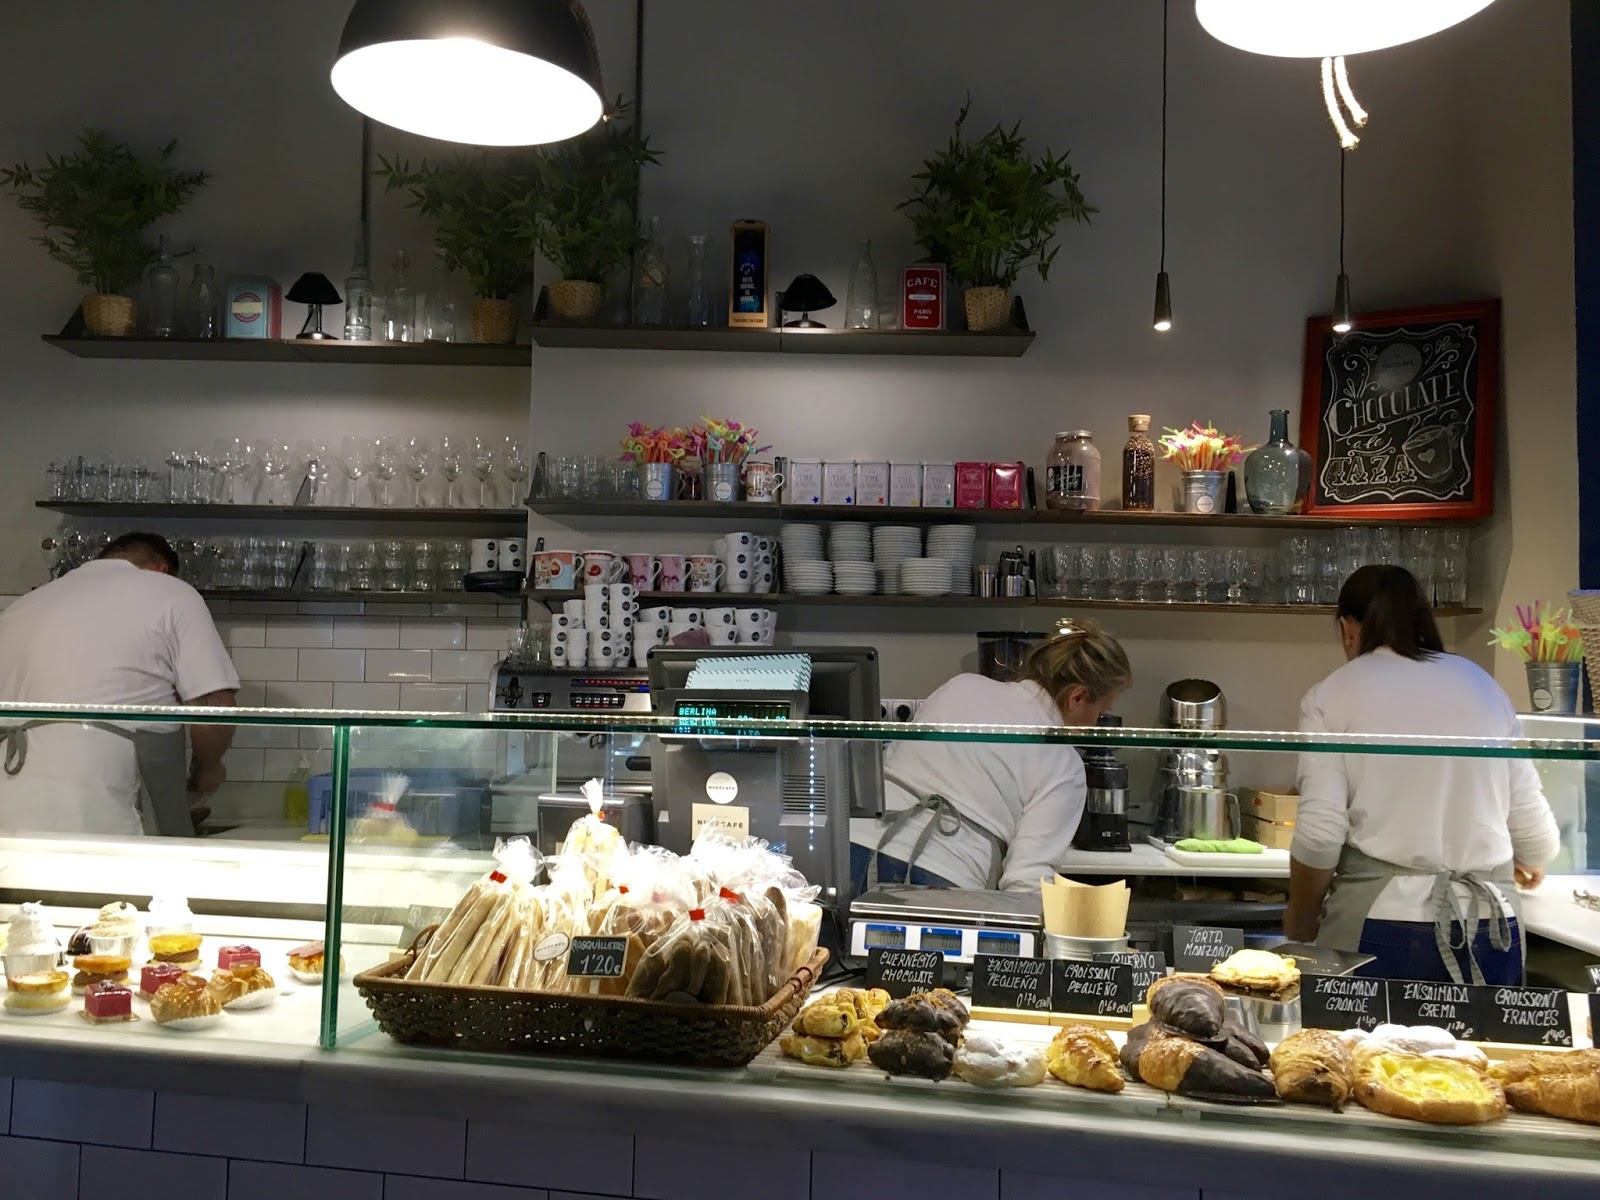 Nuezcafé: meriendas con tradición